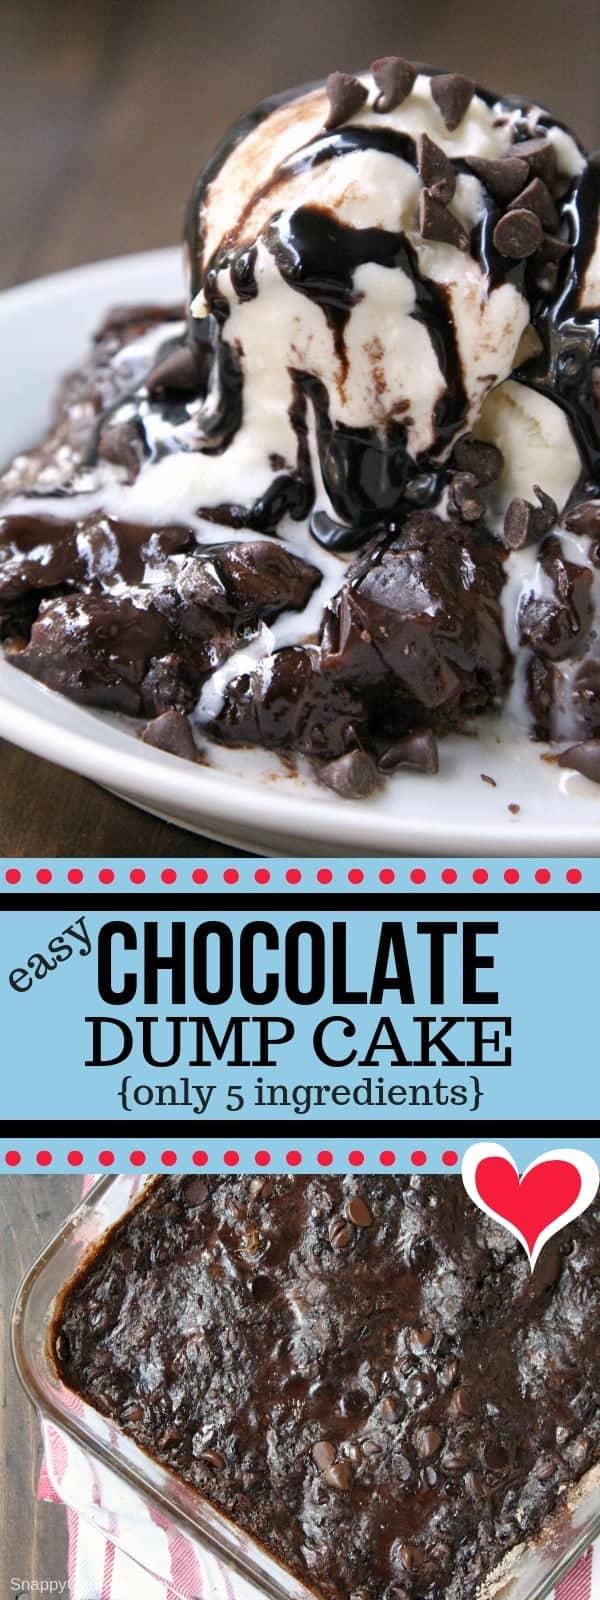 Chocolate Dump Cake (Easy Dump Cake Recipe) - Snappy Gourmet